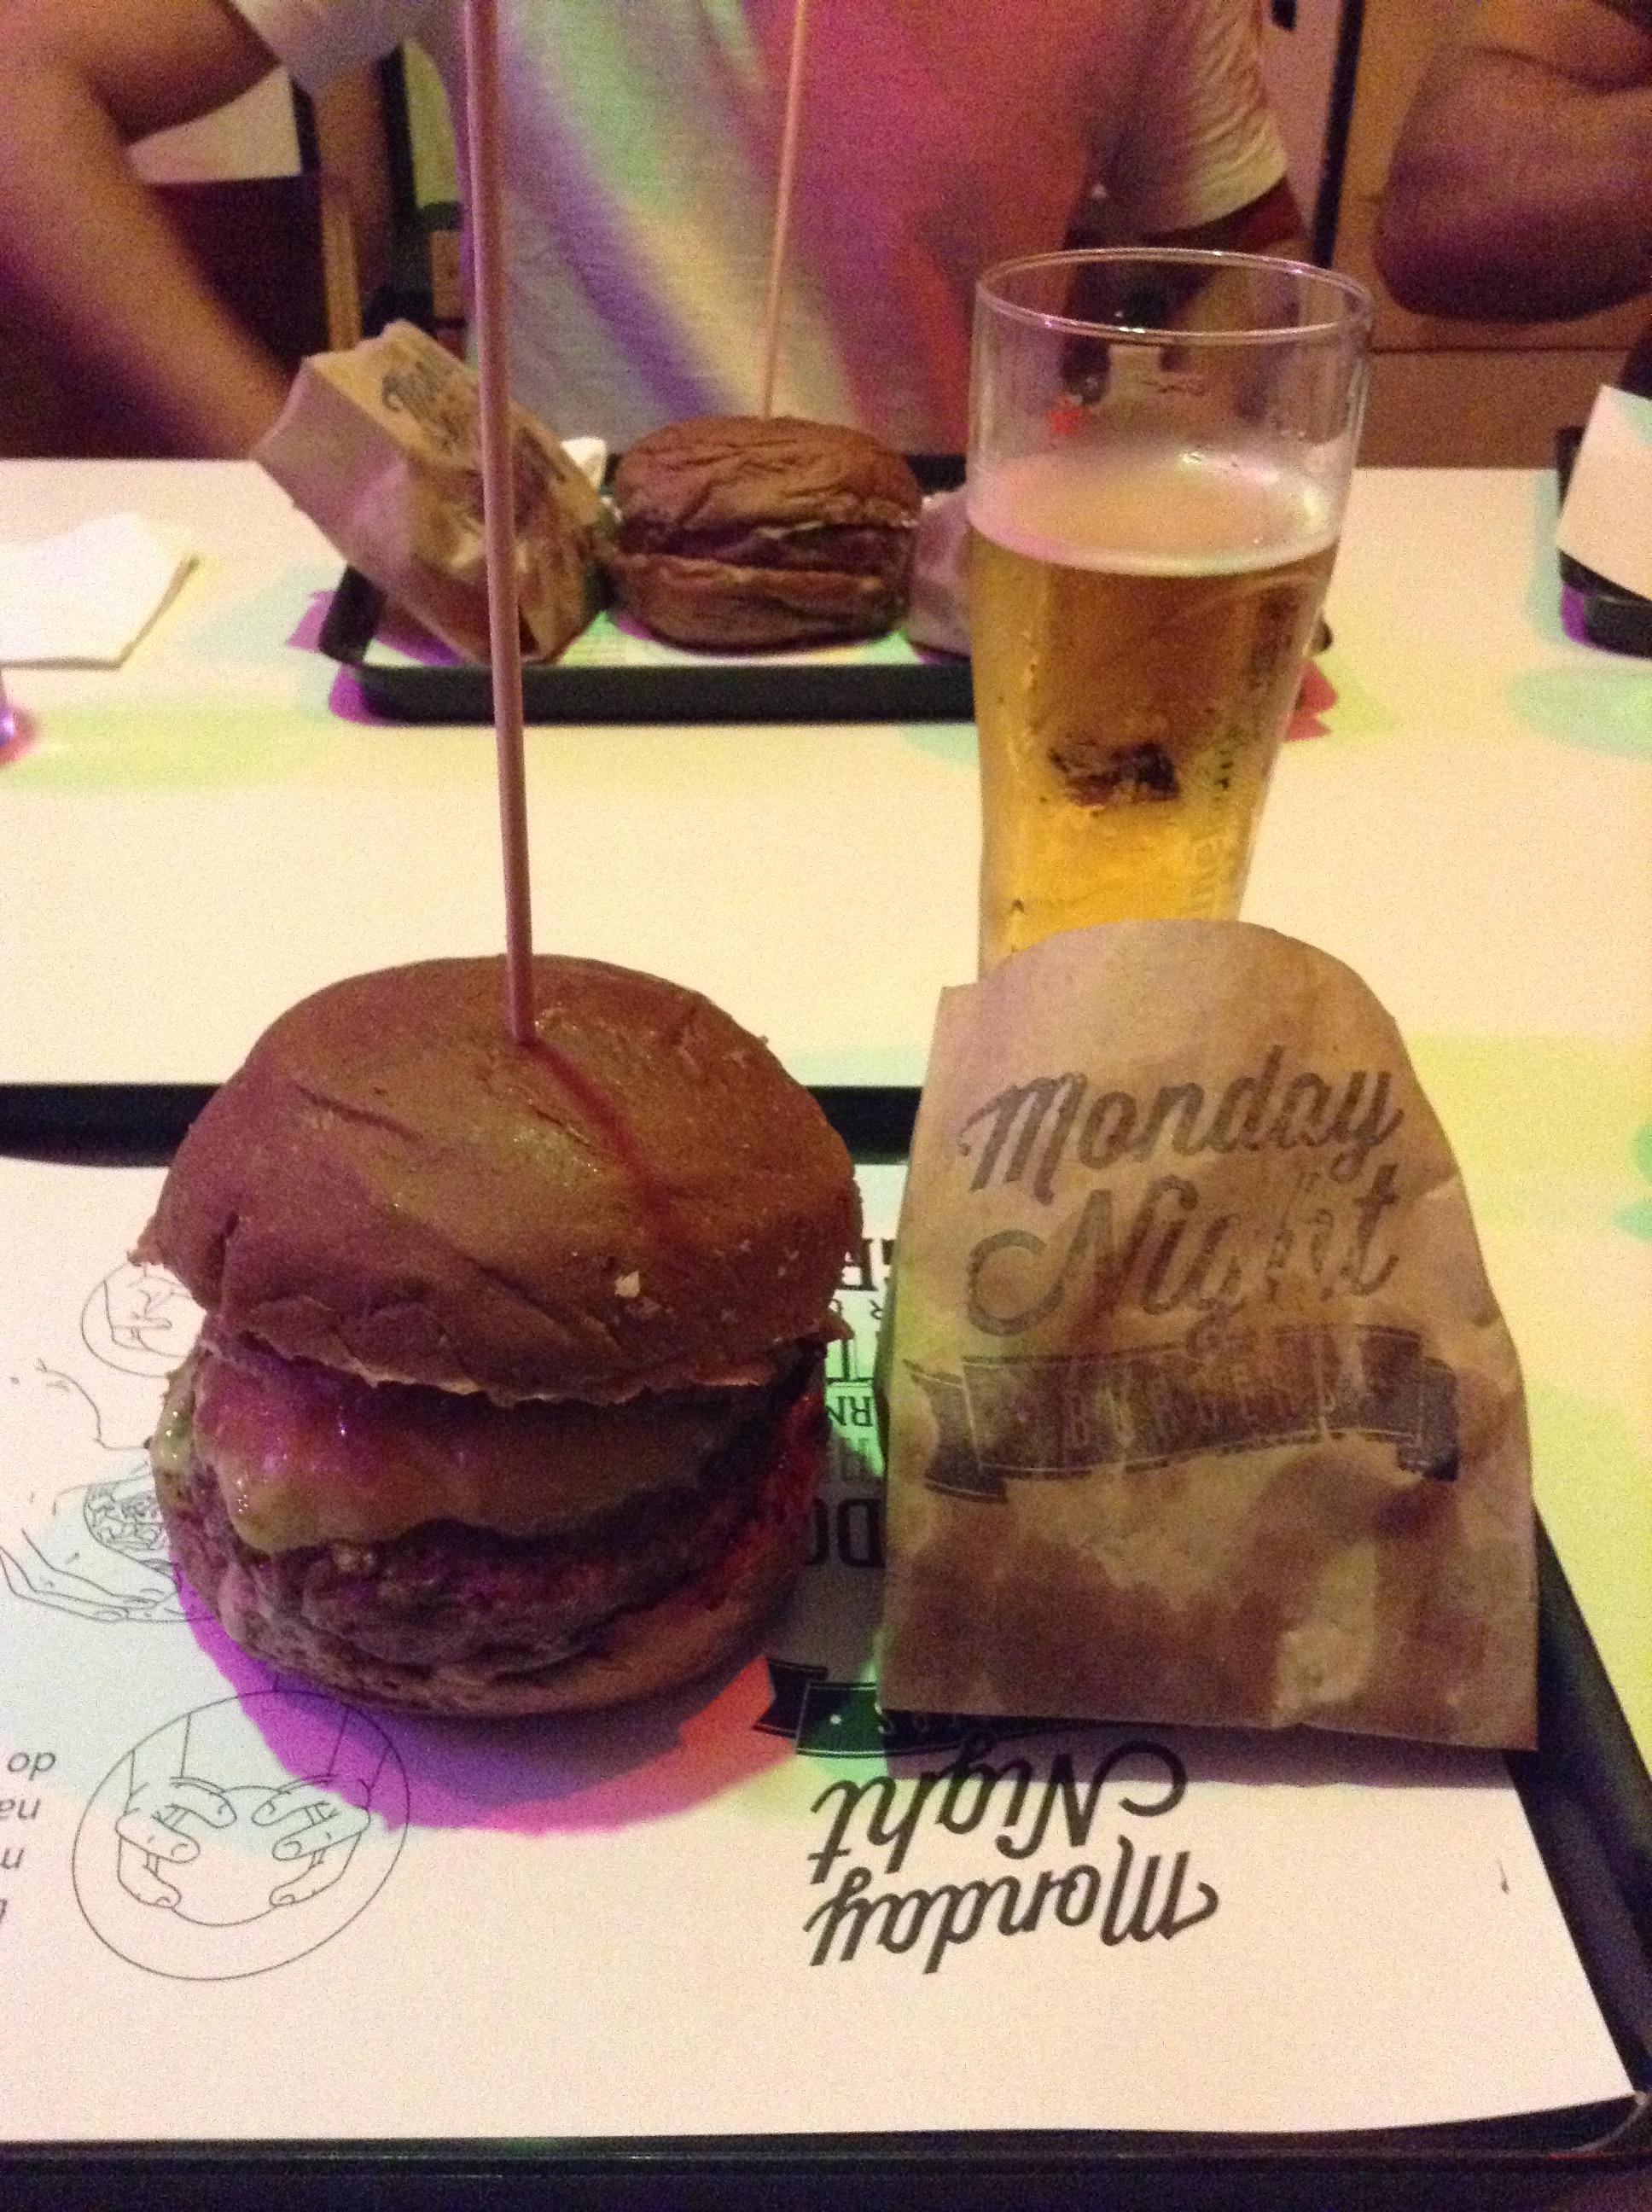 monday night burger specials